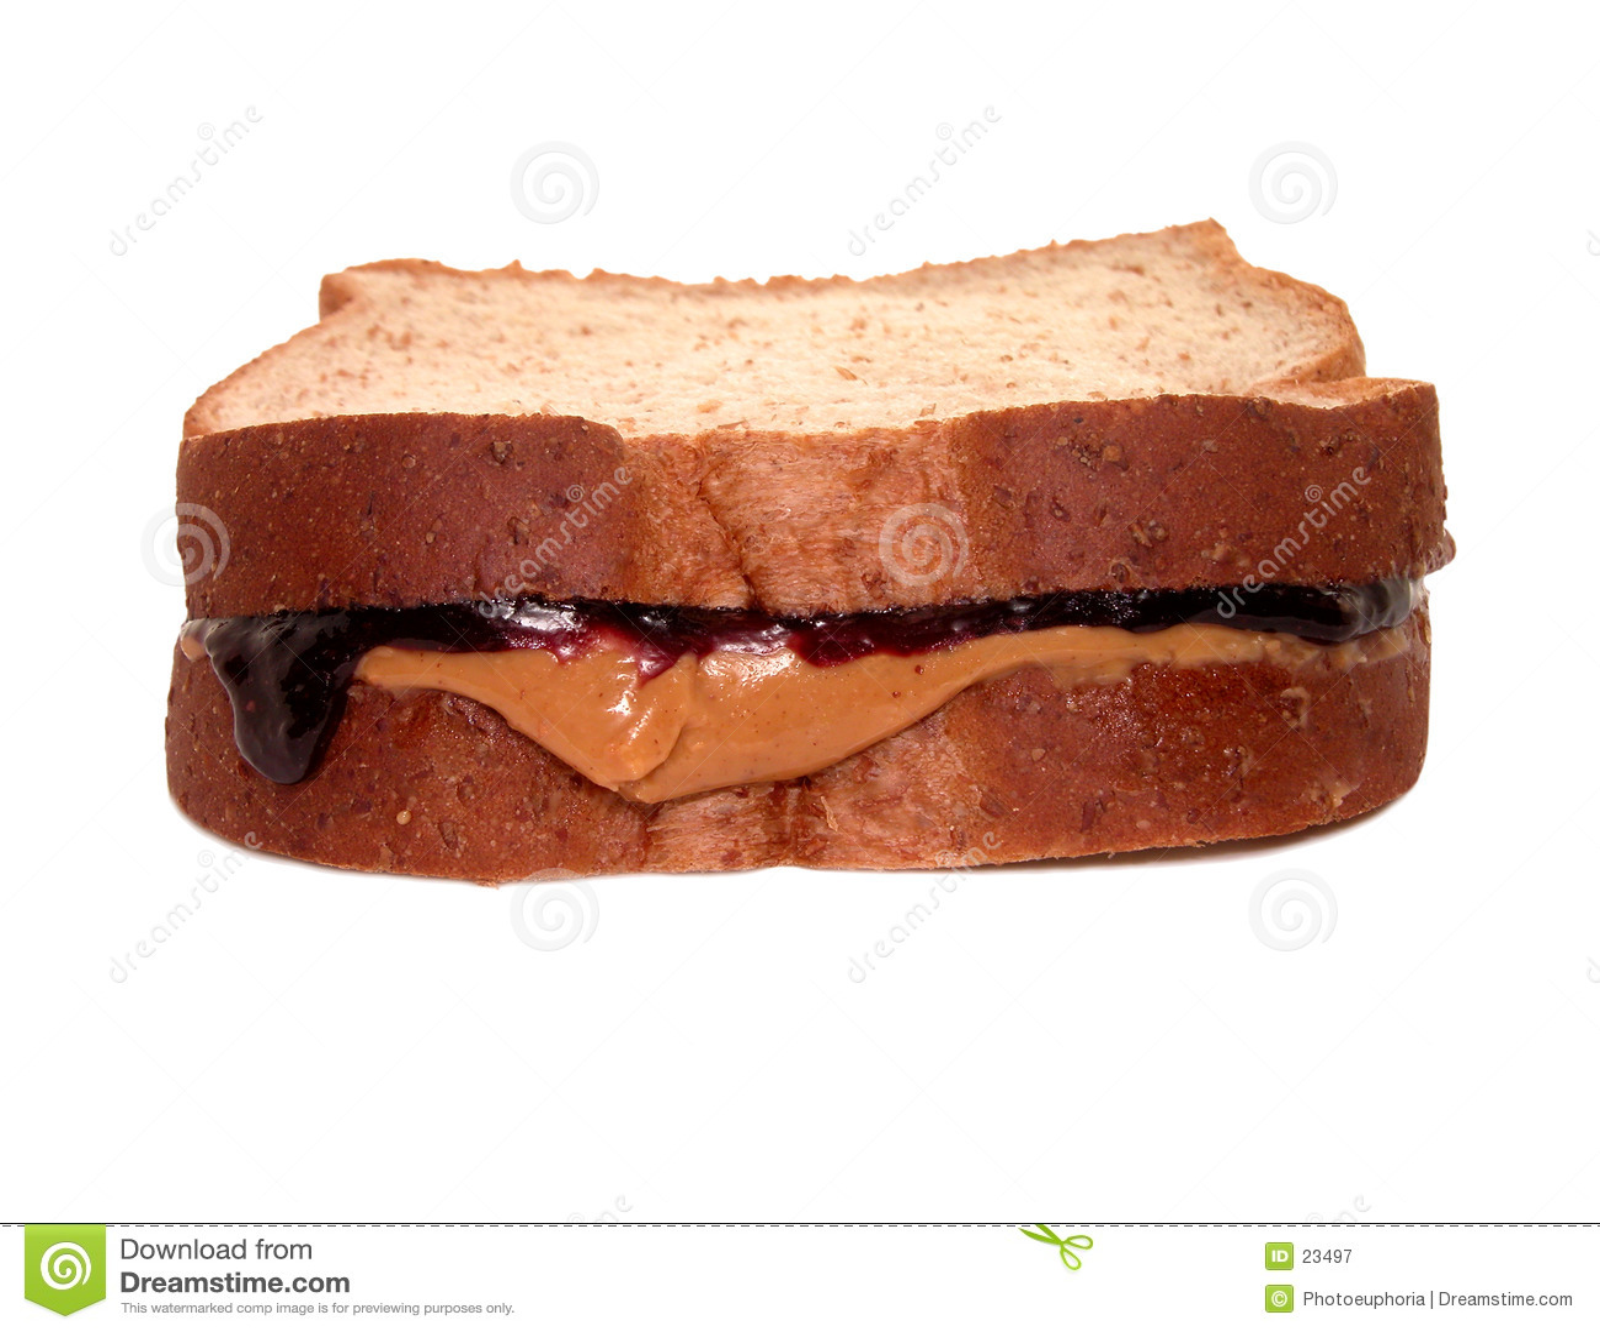 Food: PB&J Sandwich